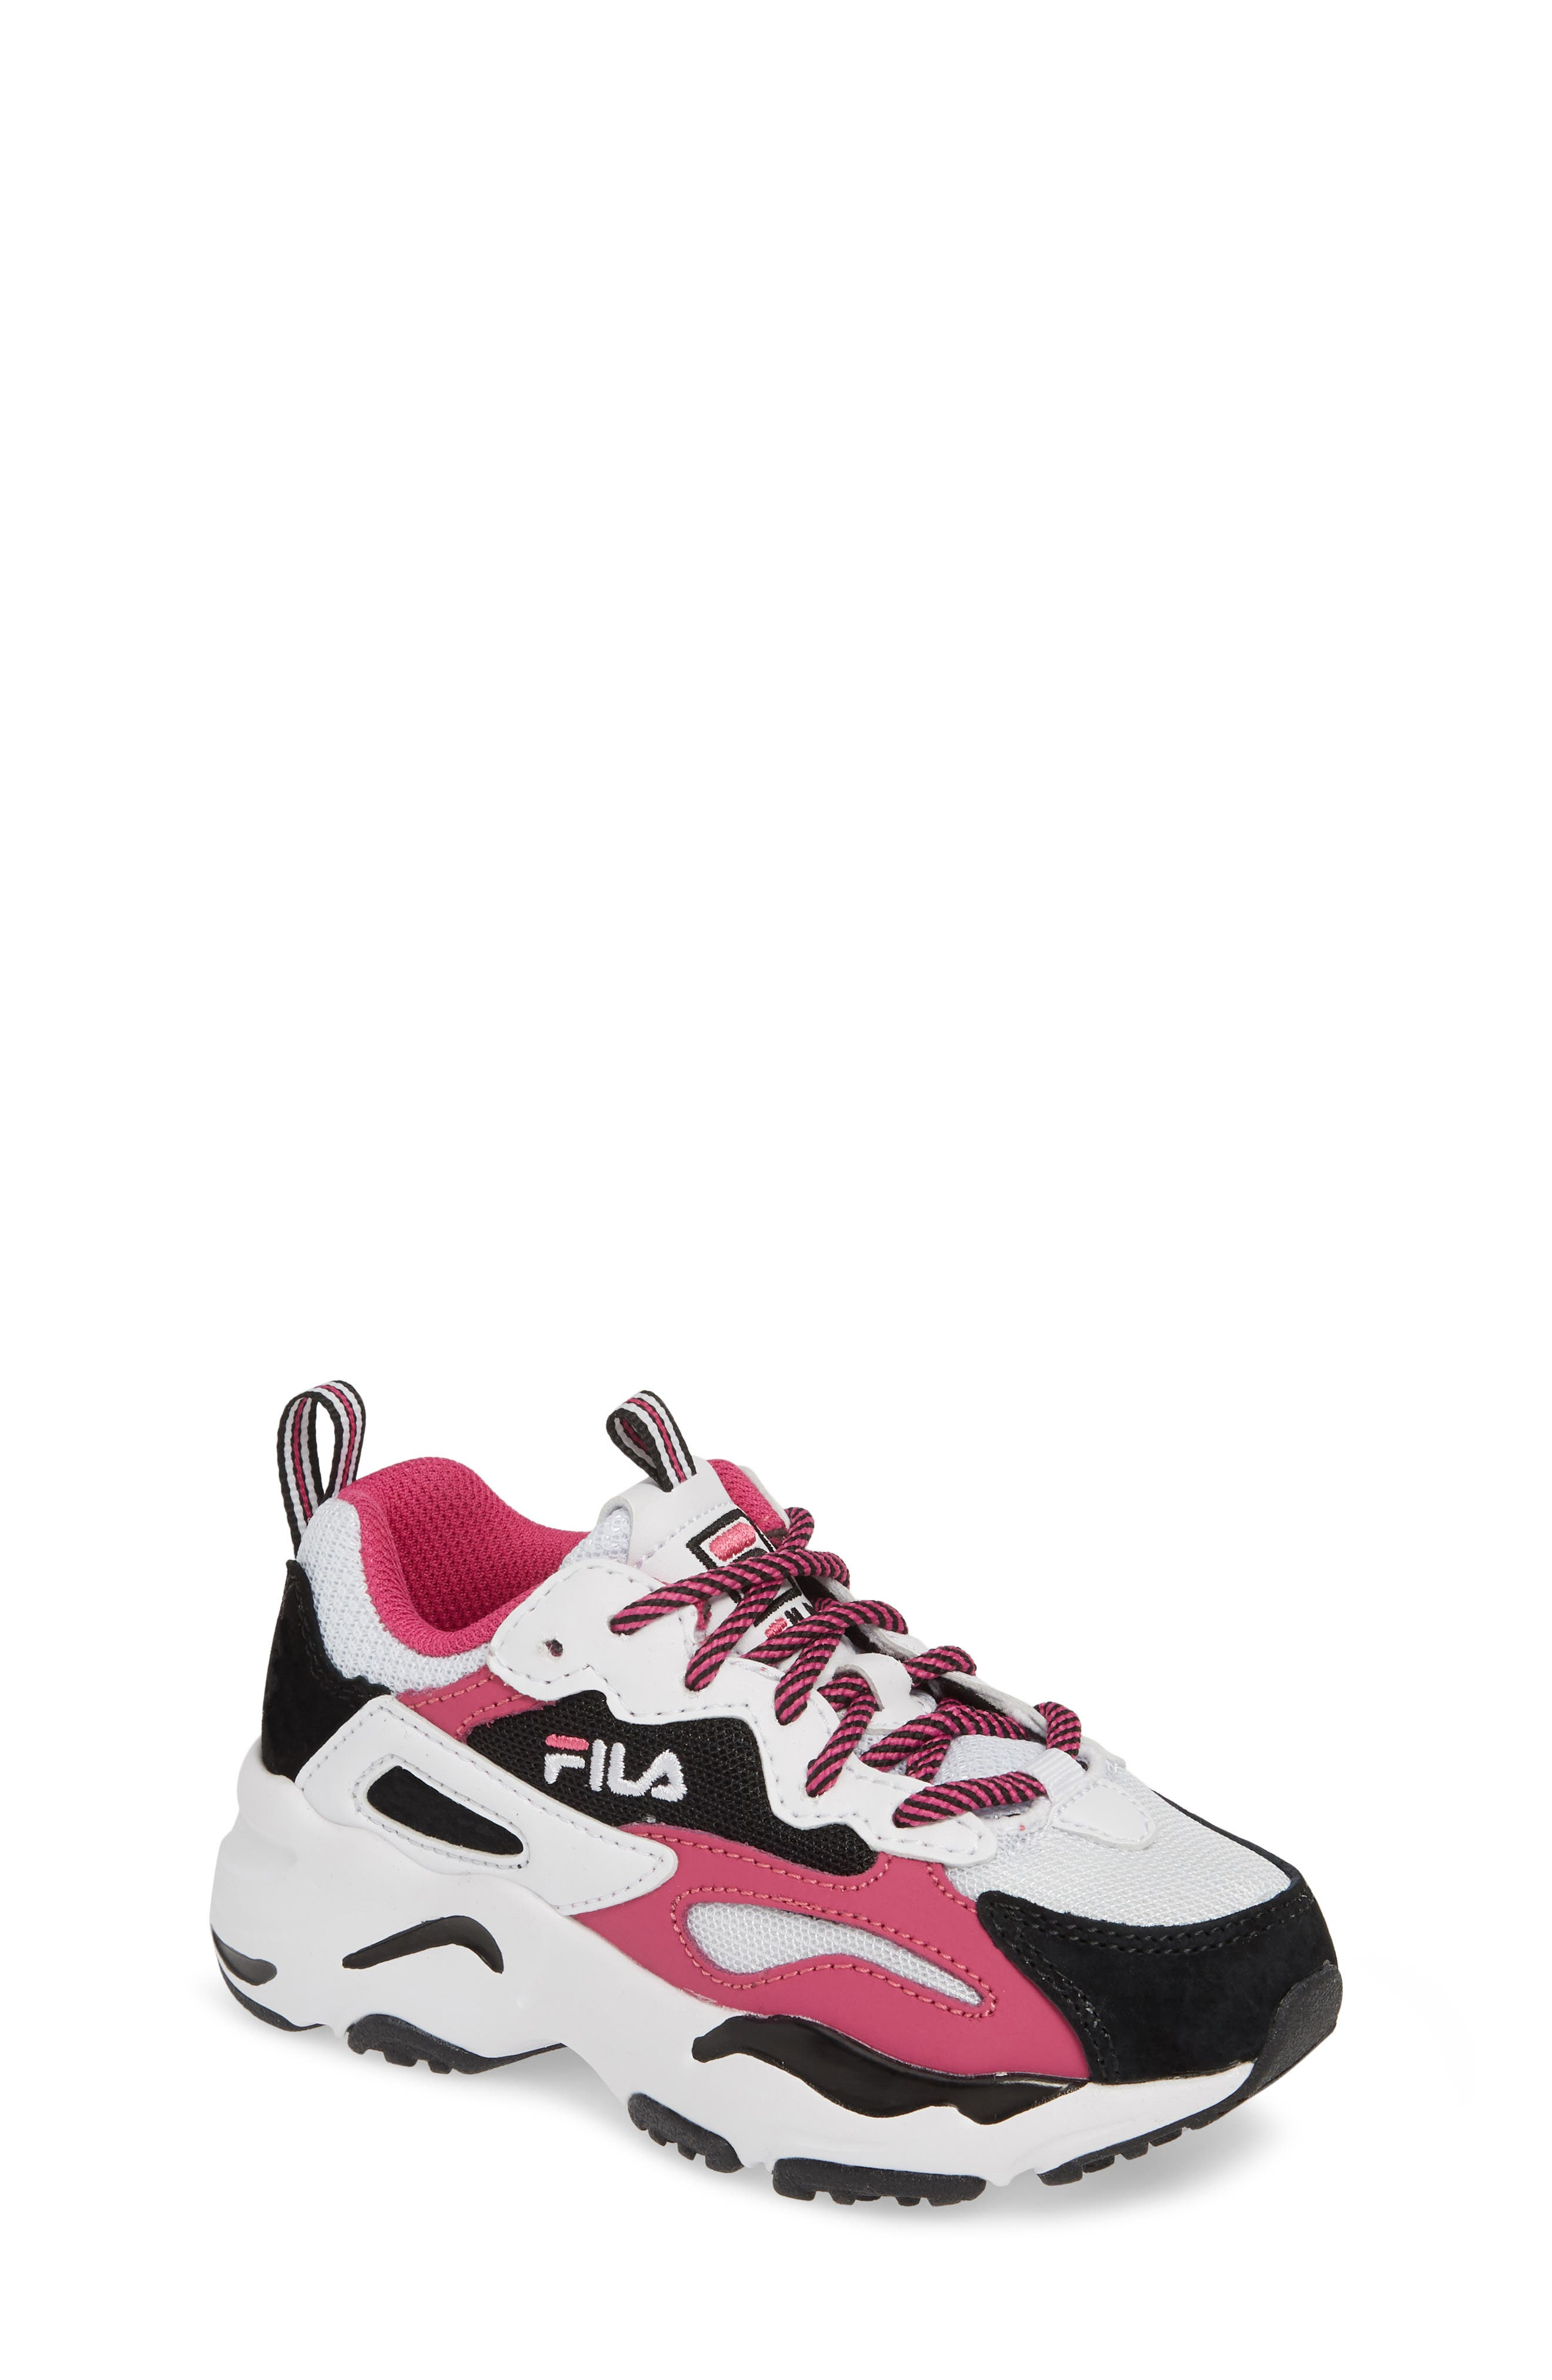 Kids Fila Ray Tracer Sneaker Size 45 M  White